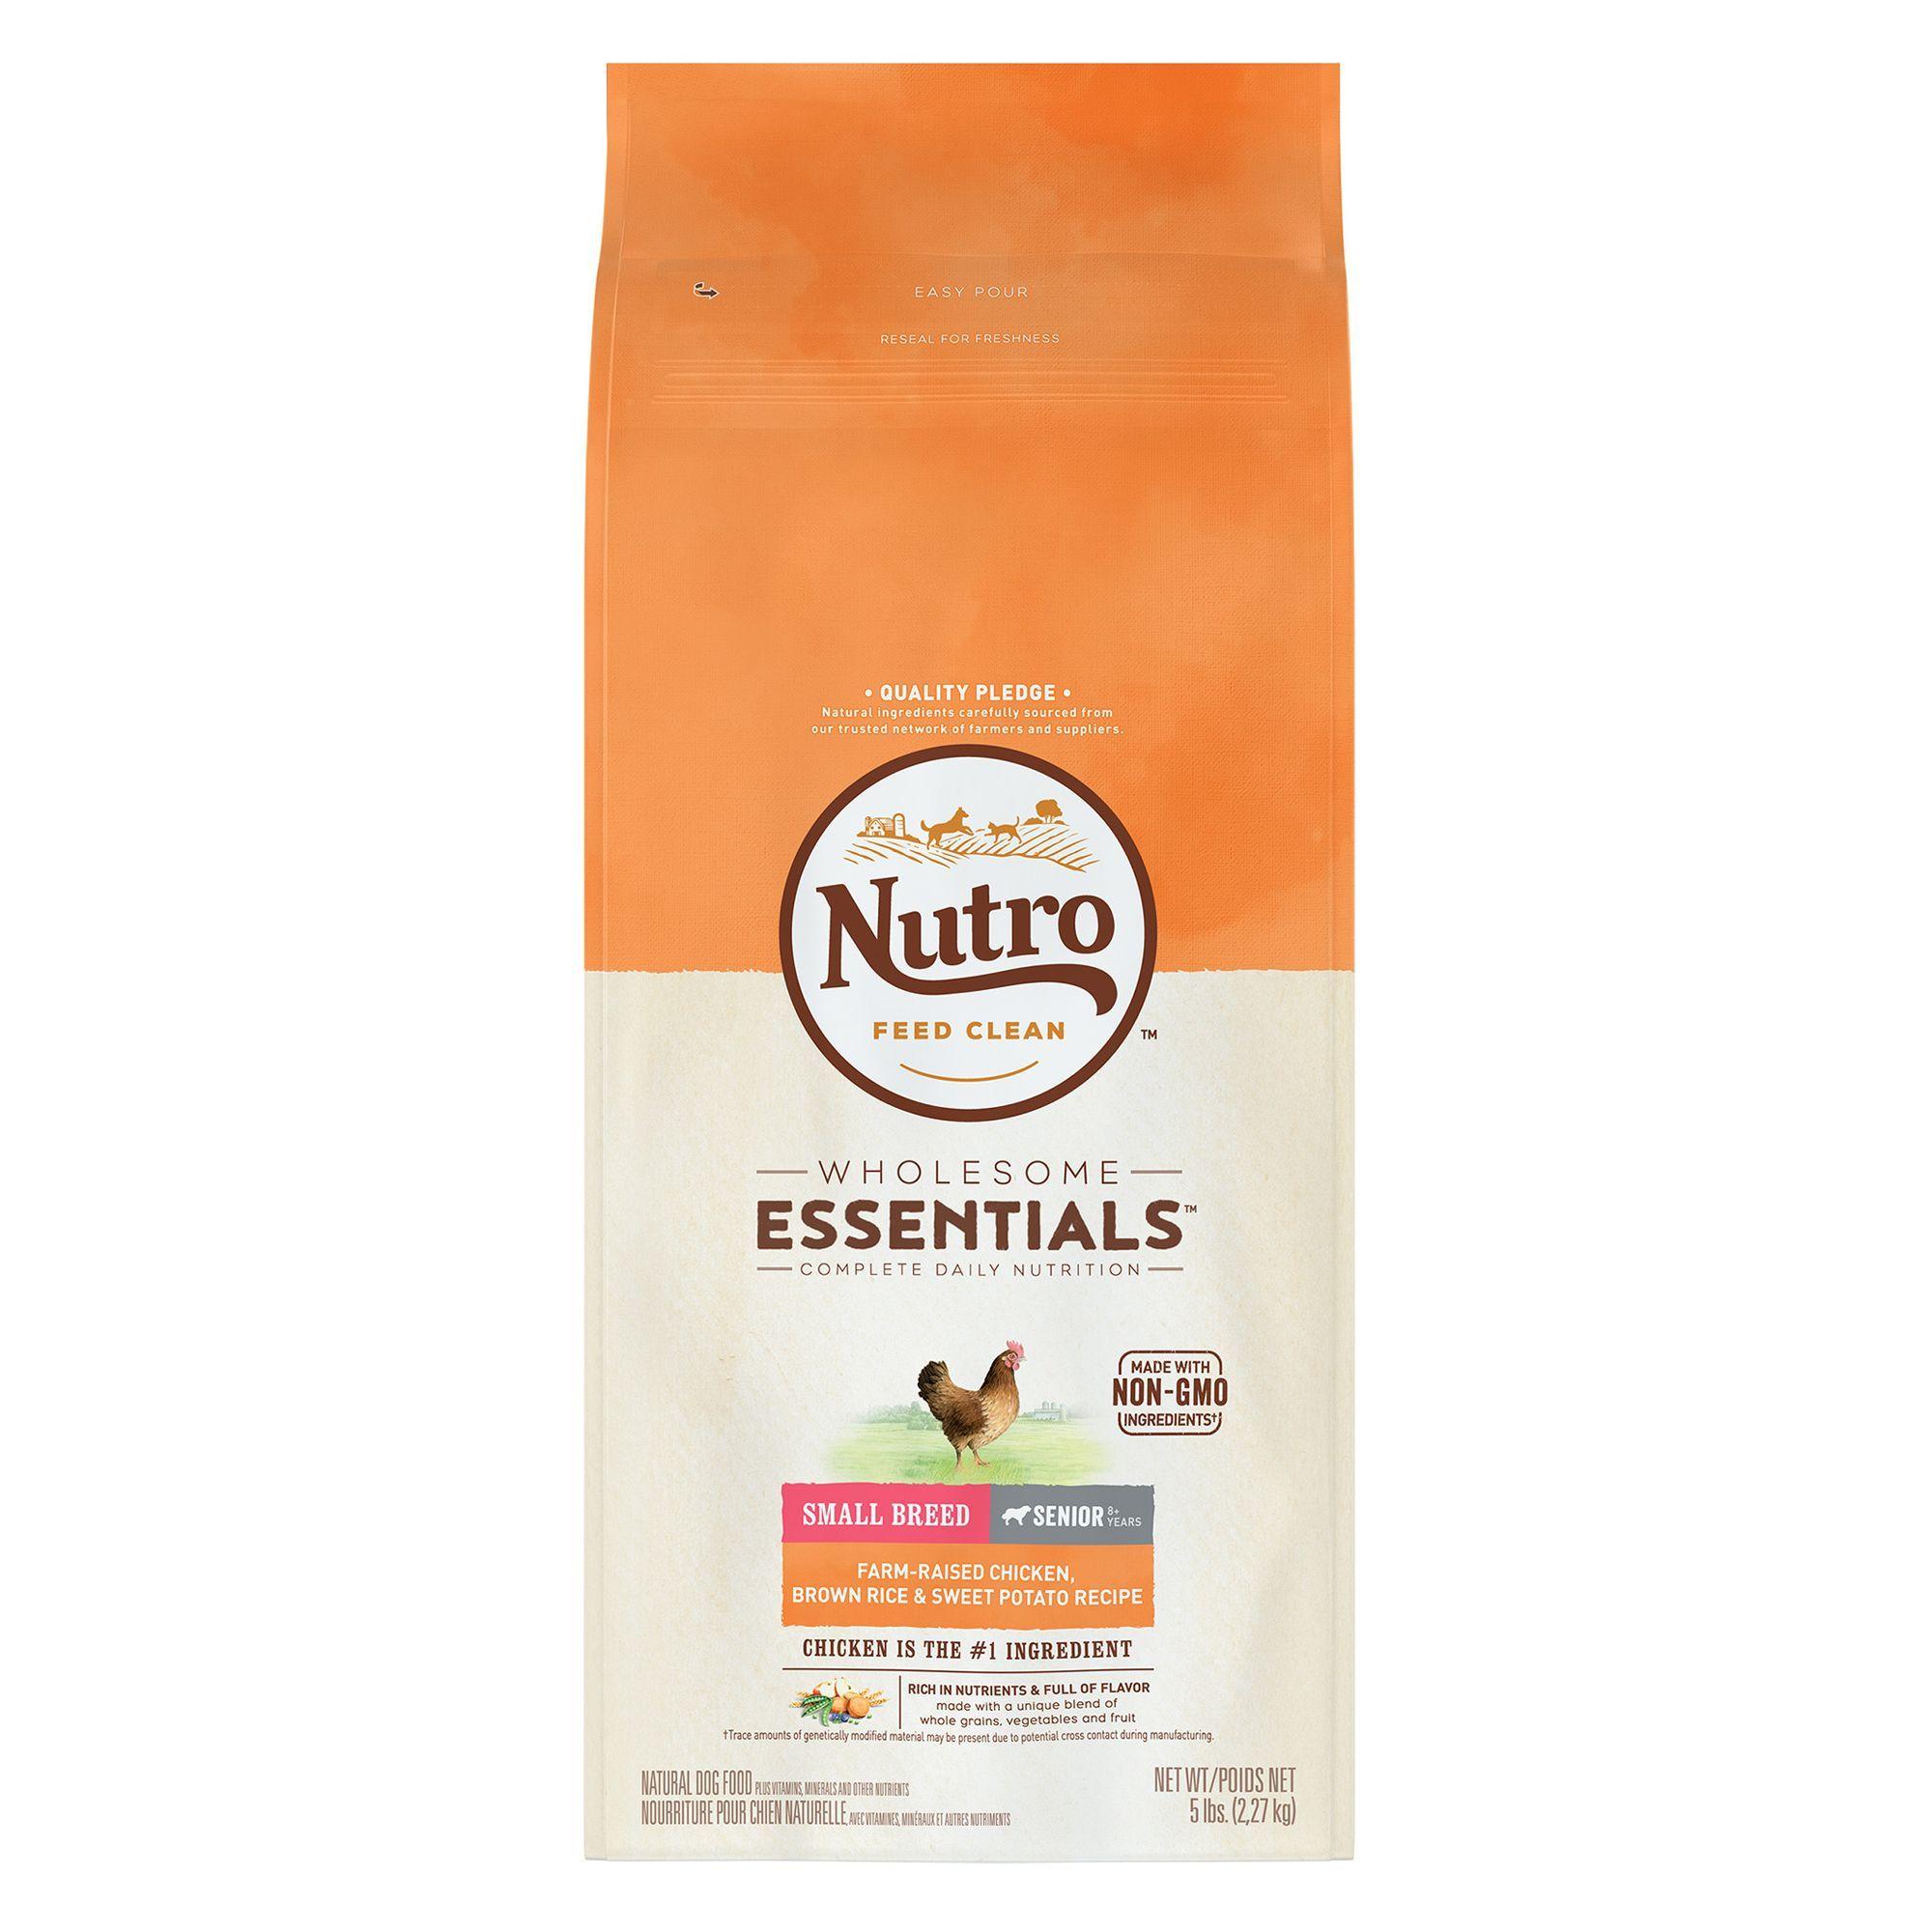 Nutro Wholesome Essentials Small Breed Senior Dog Food Chicken